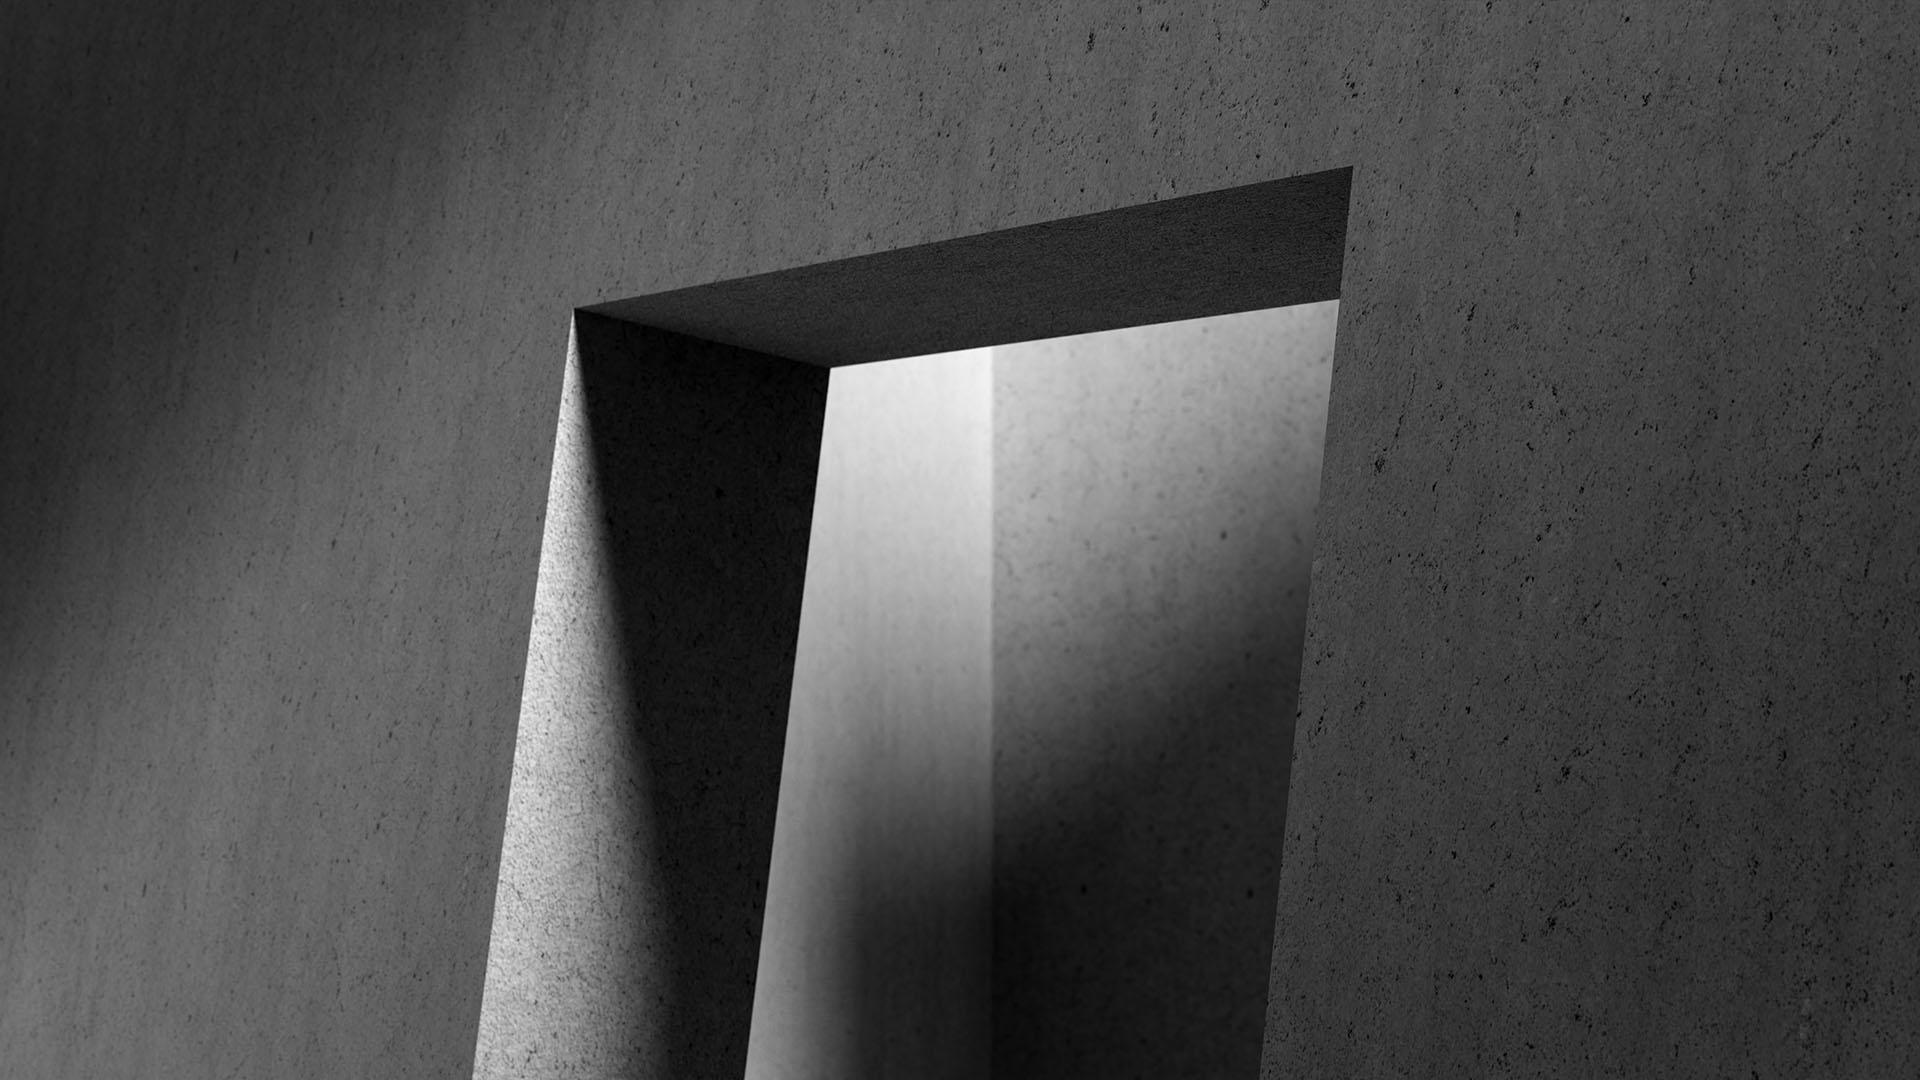 Background image of a doorway.